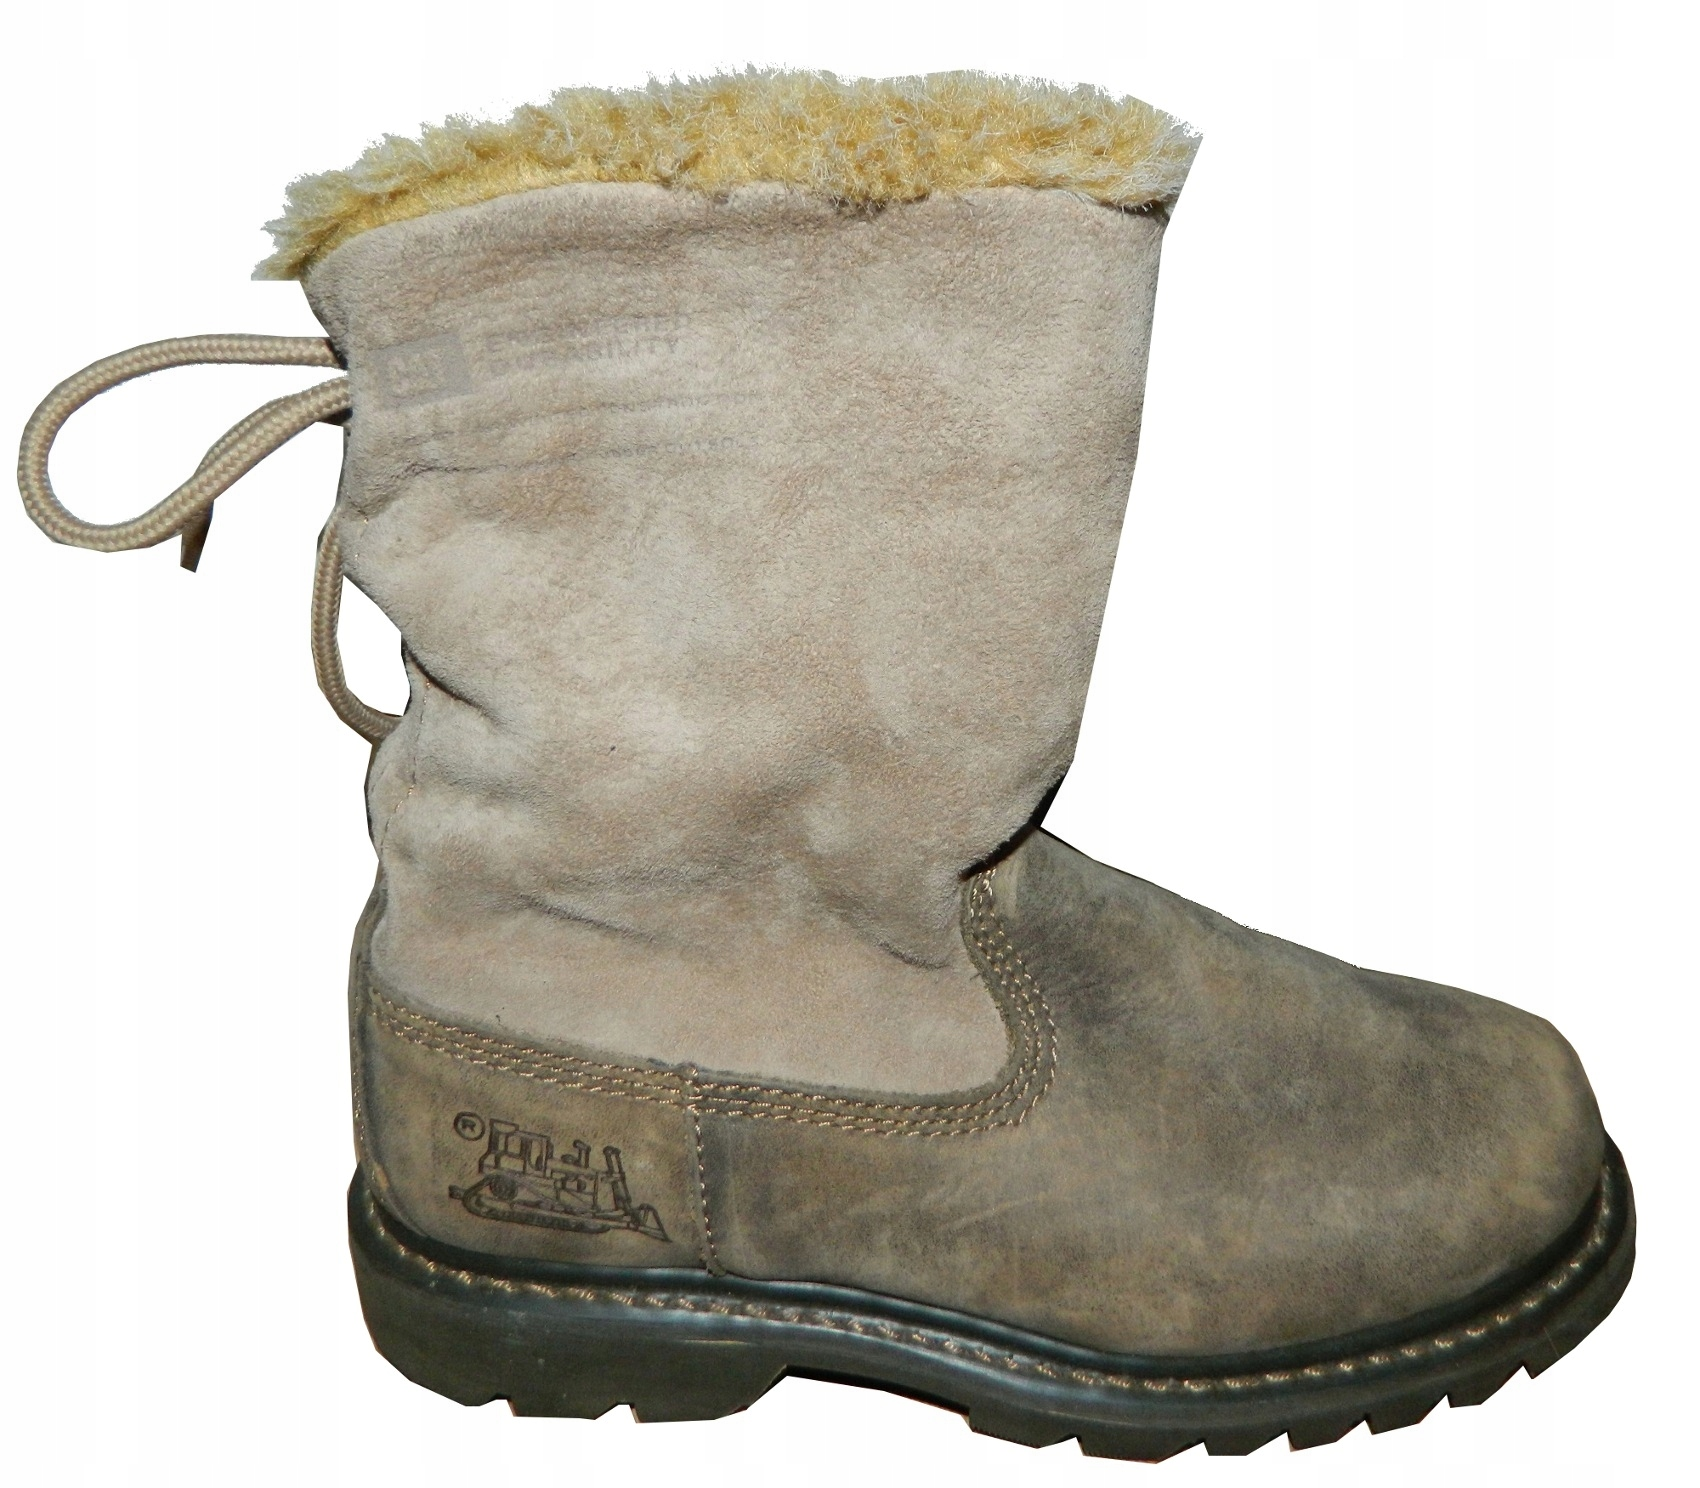 f6f0f8f5d2195 CAT Caterpillar buty zimowe jak nowe 37 - 7585140669 - oficjalne ...